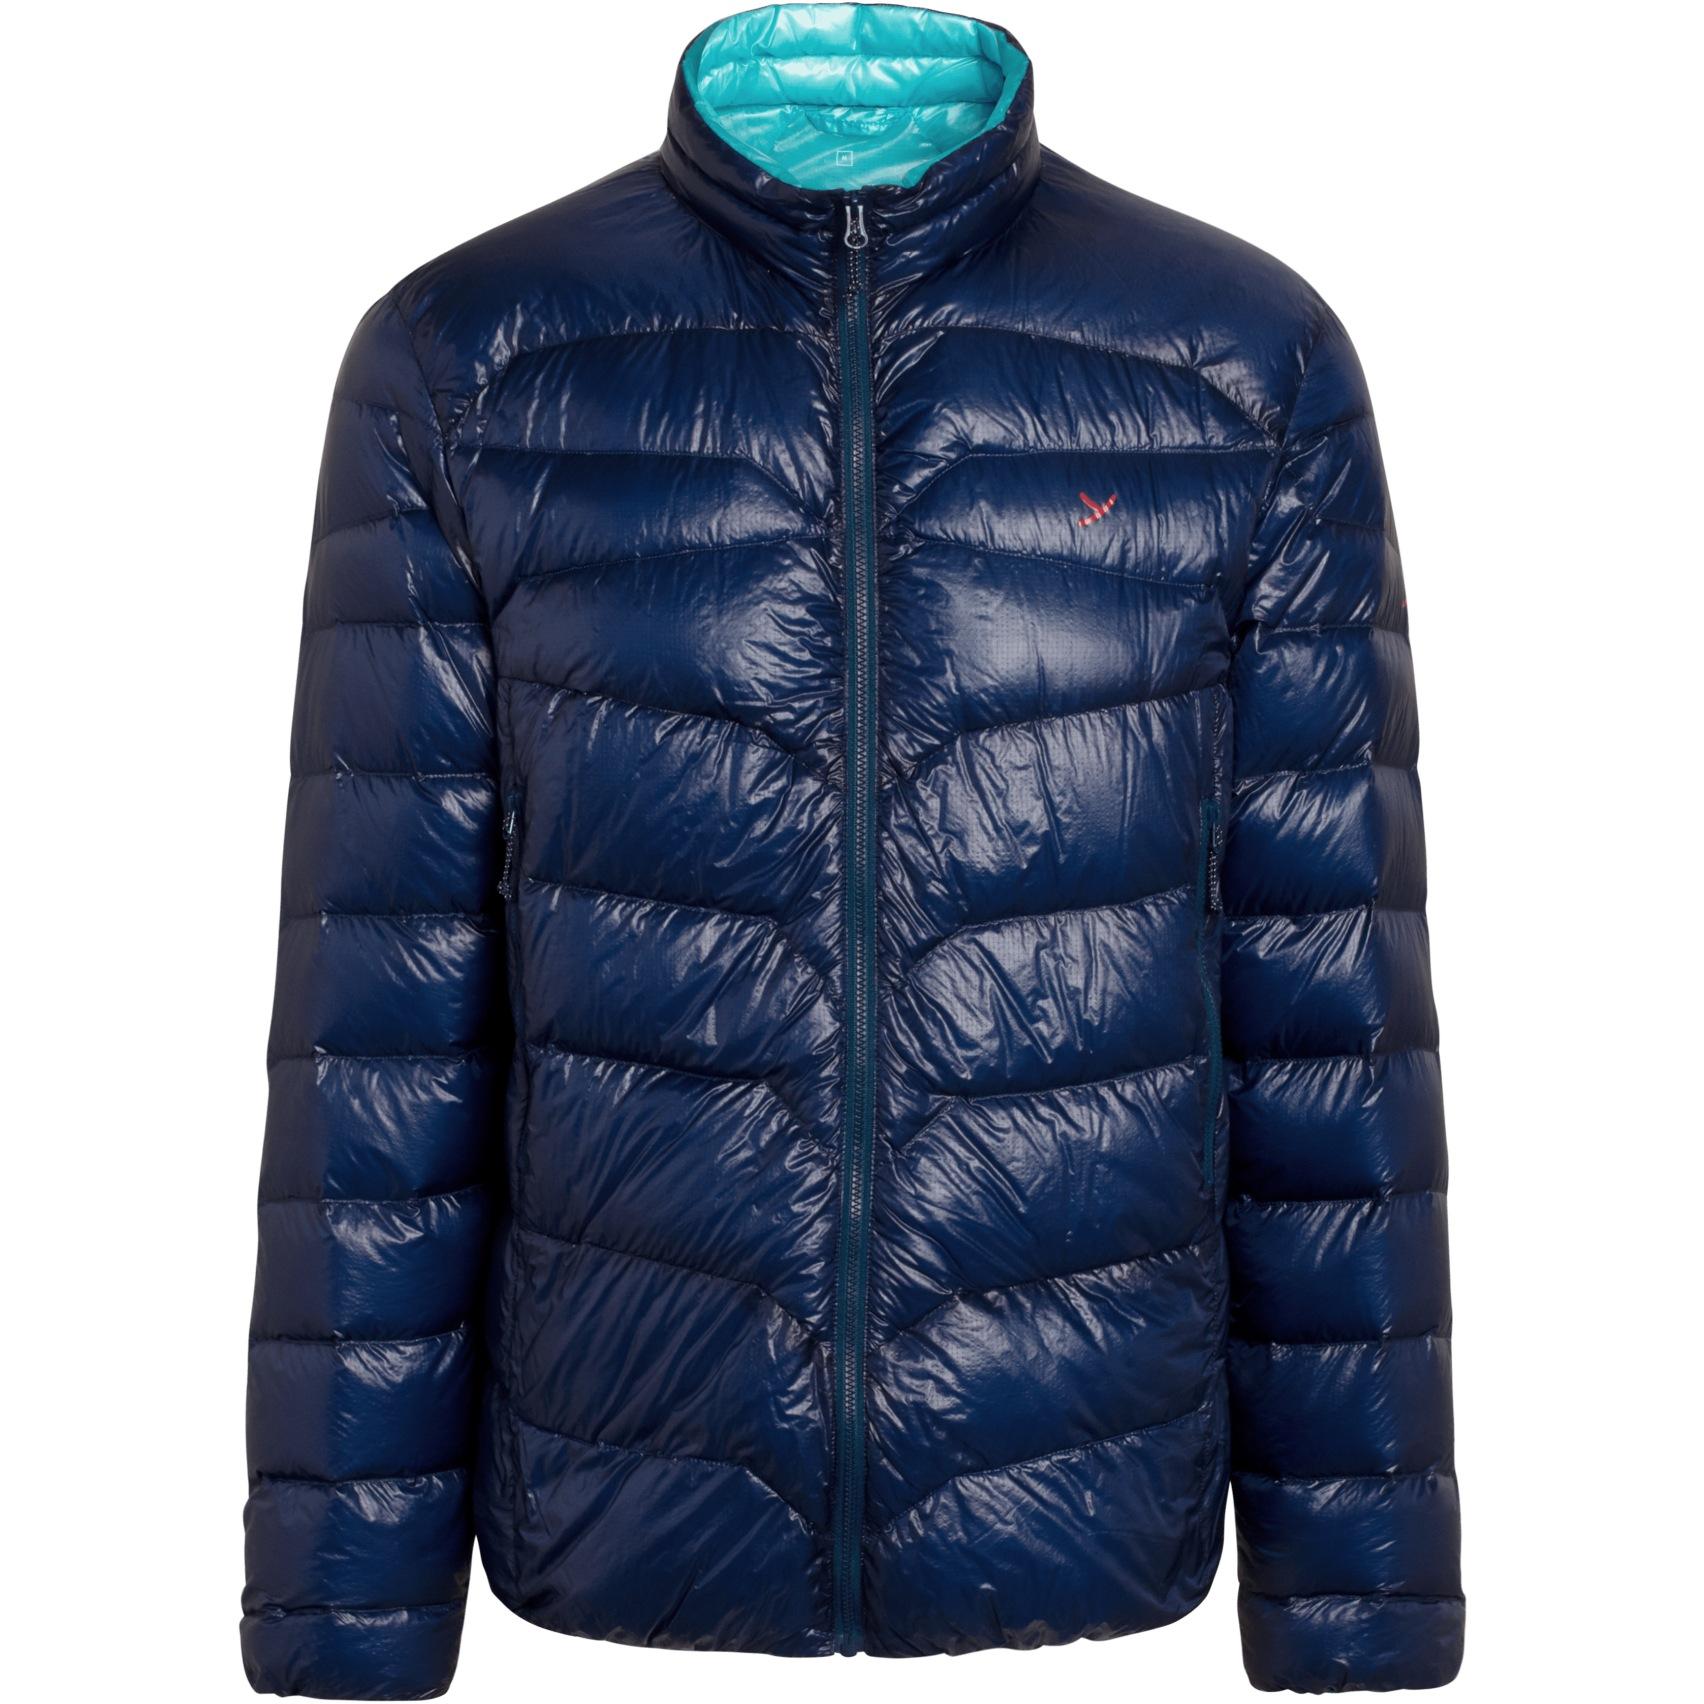 Y by Nordisk Strato Men's Ultralight Down Jacket - estate blue